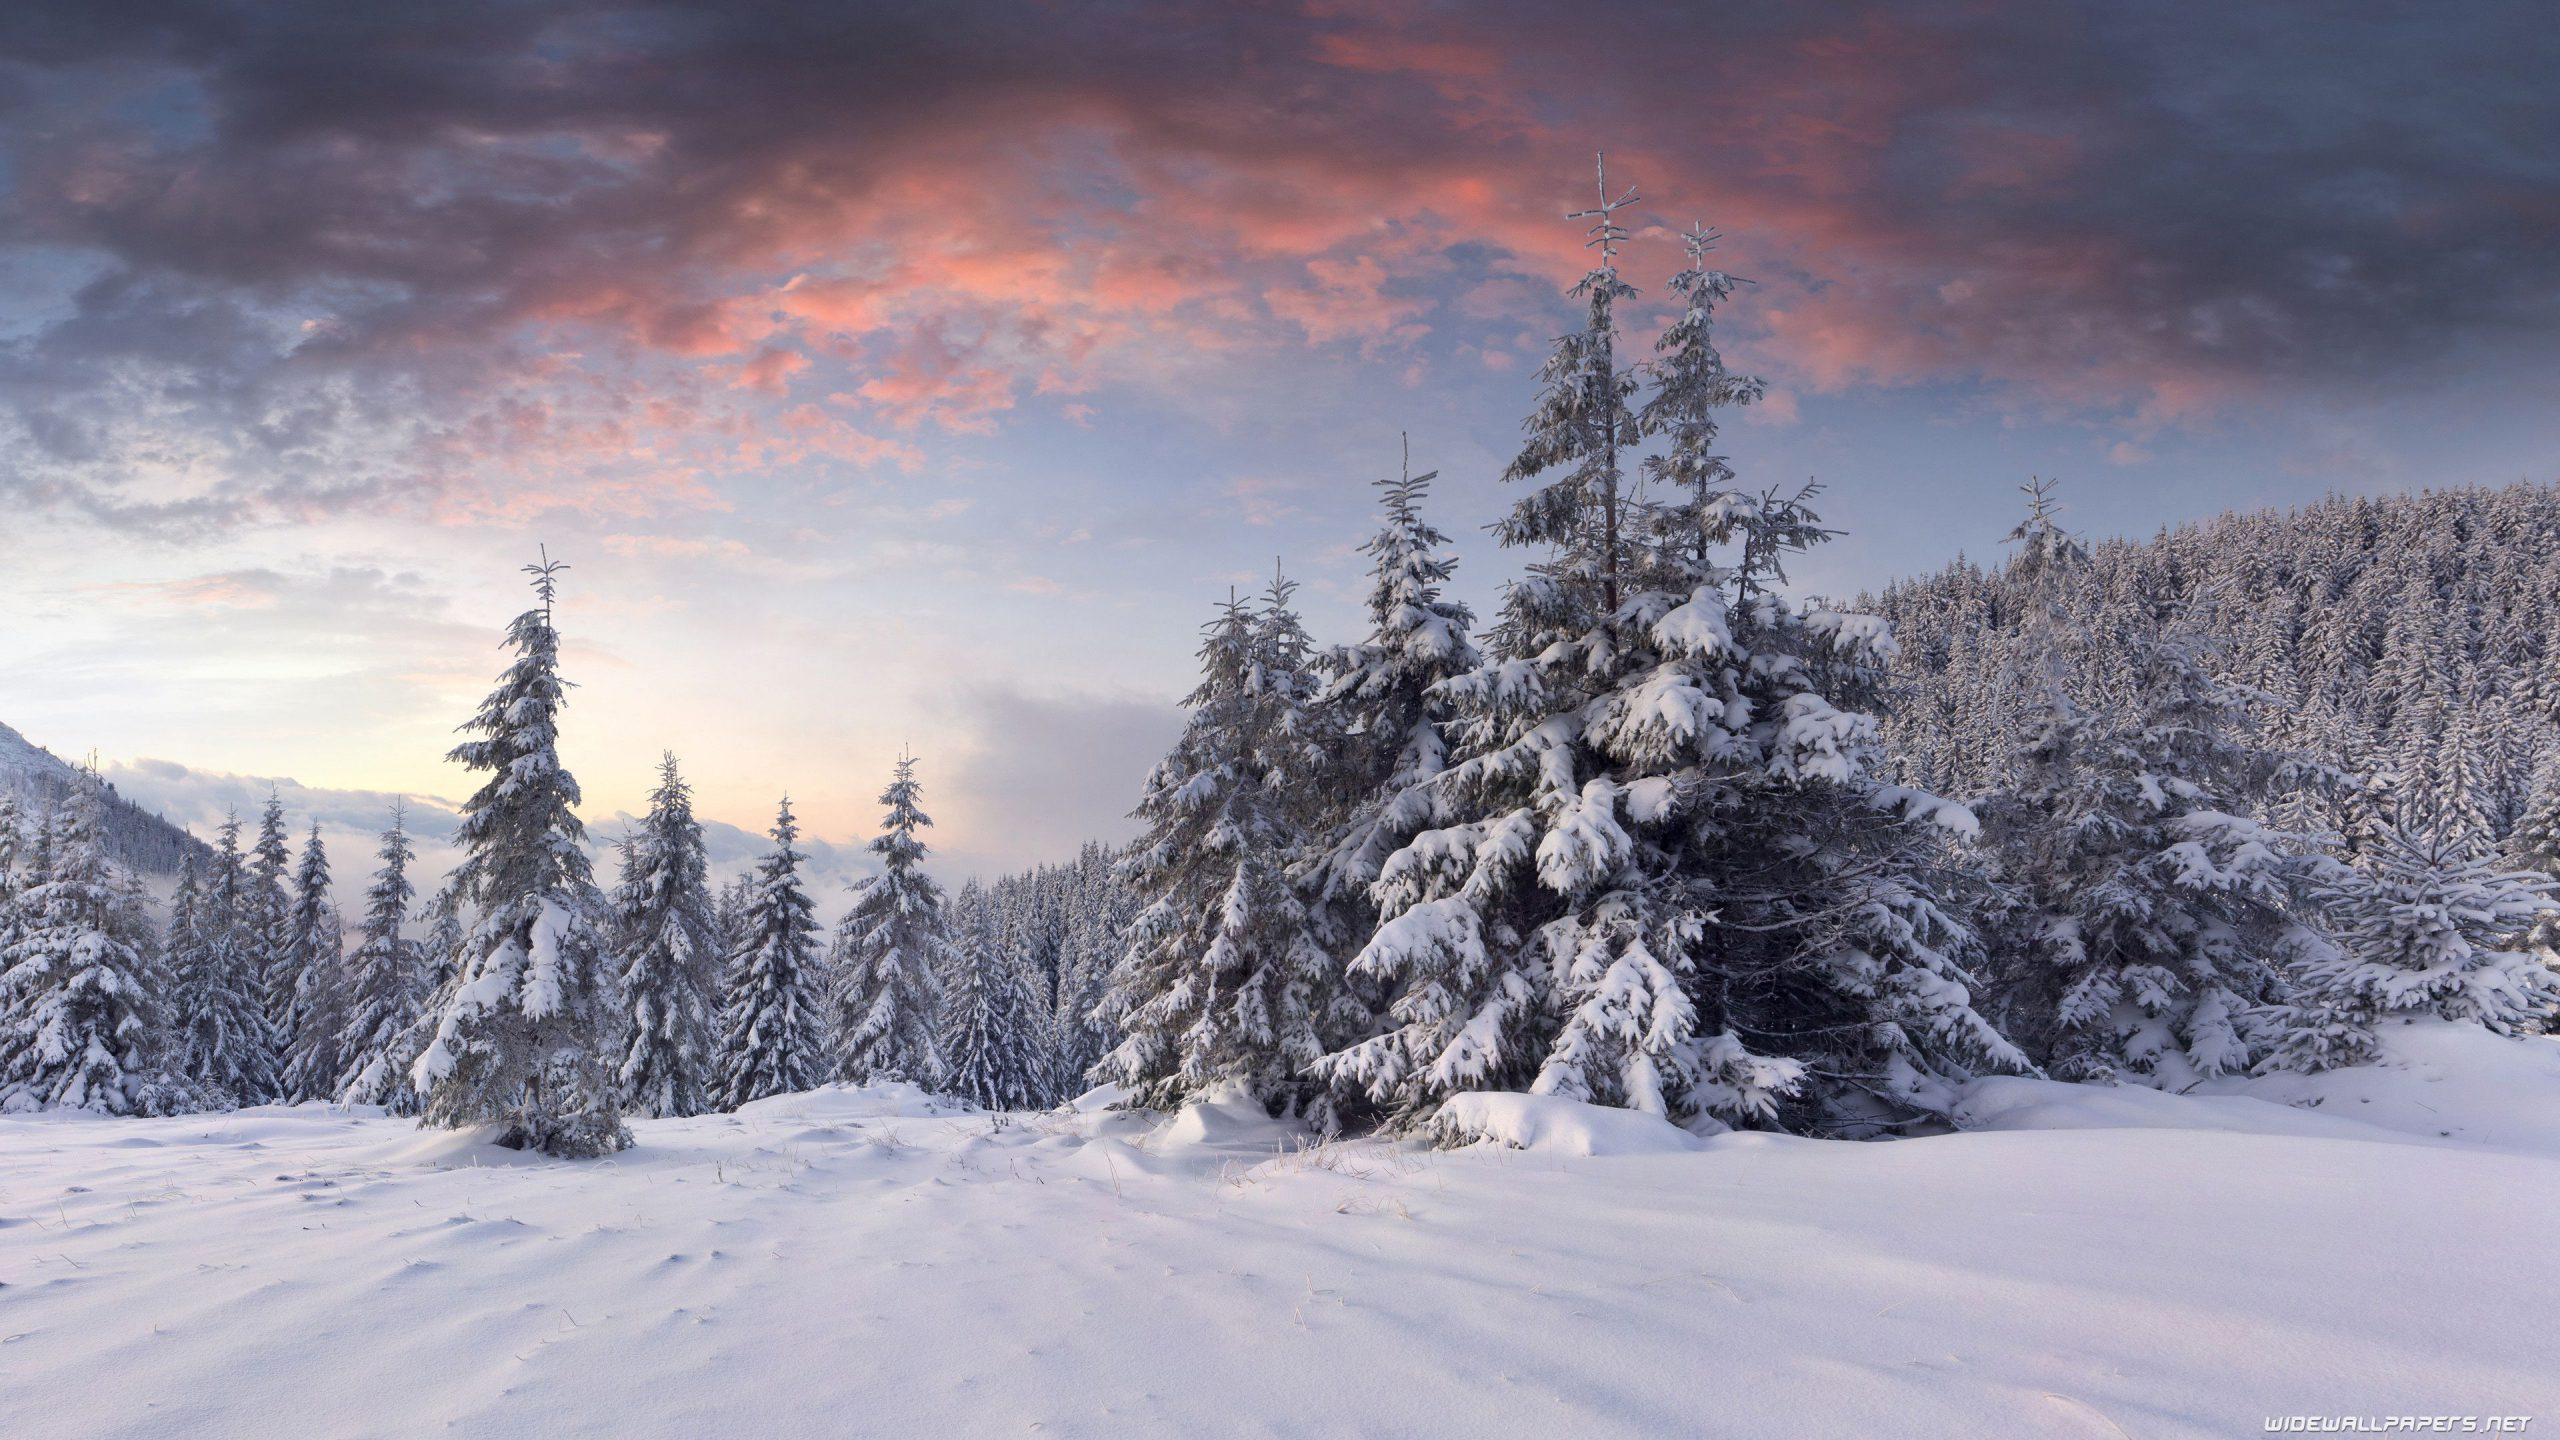 darkness clouds Winter Wallpaper 4K